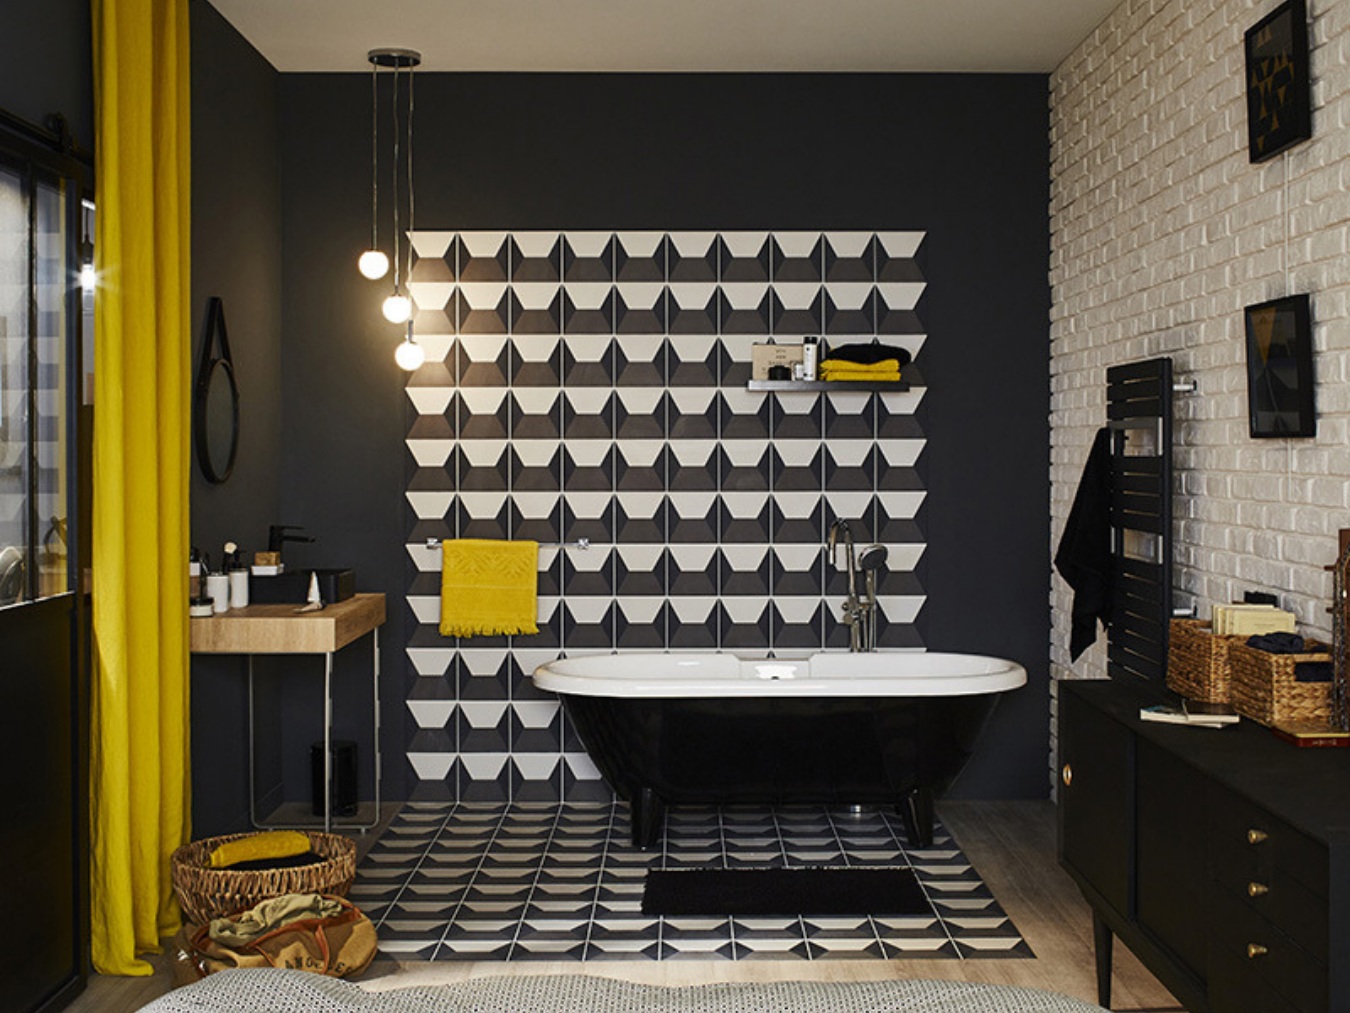 carrelage-de-salle-de-bain-inspiration